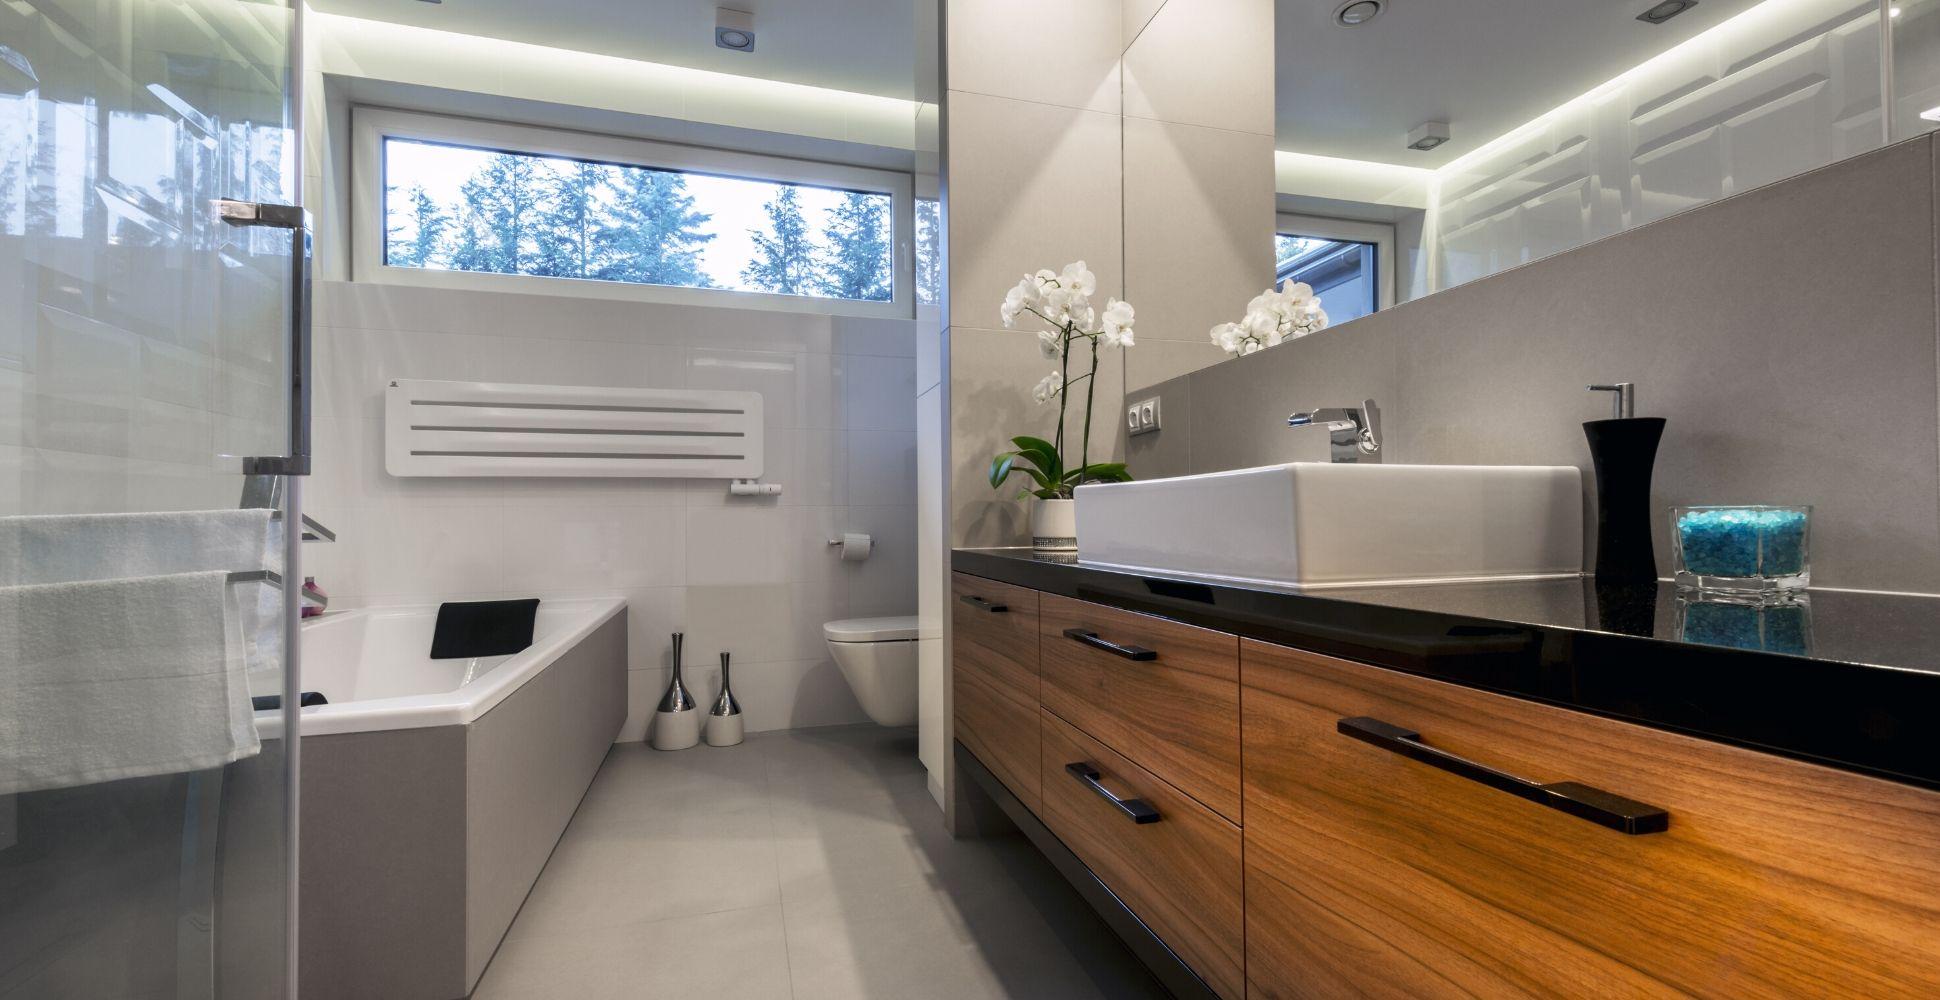 Best Bathroom Heater Reviews UK 2020